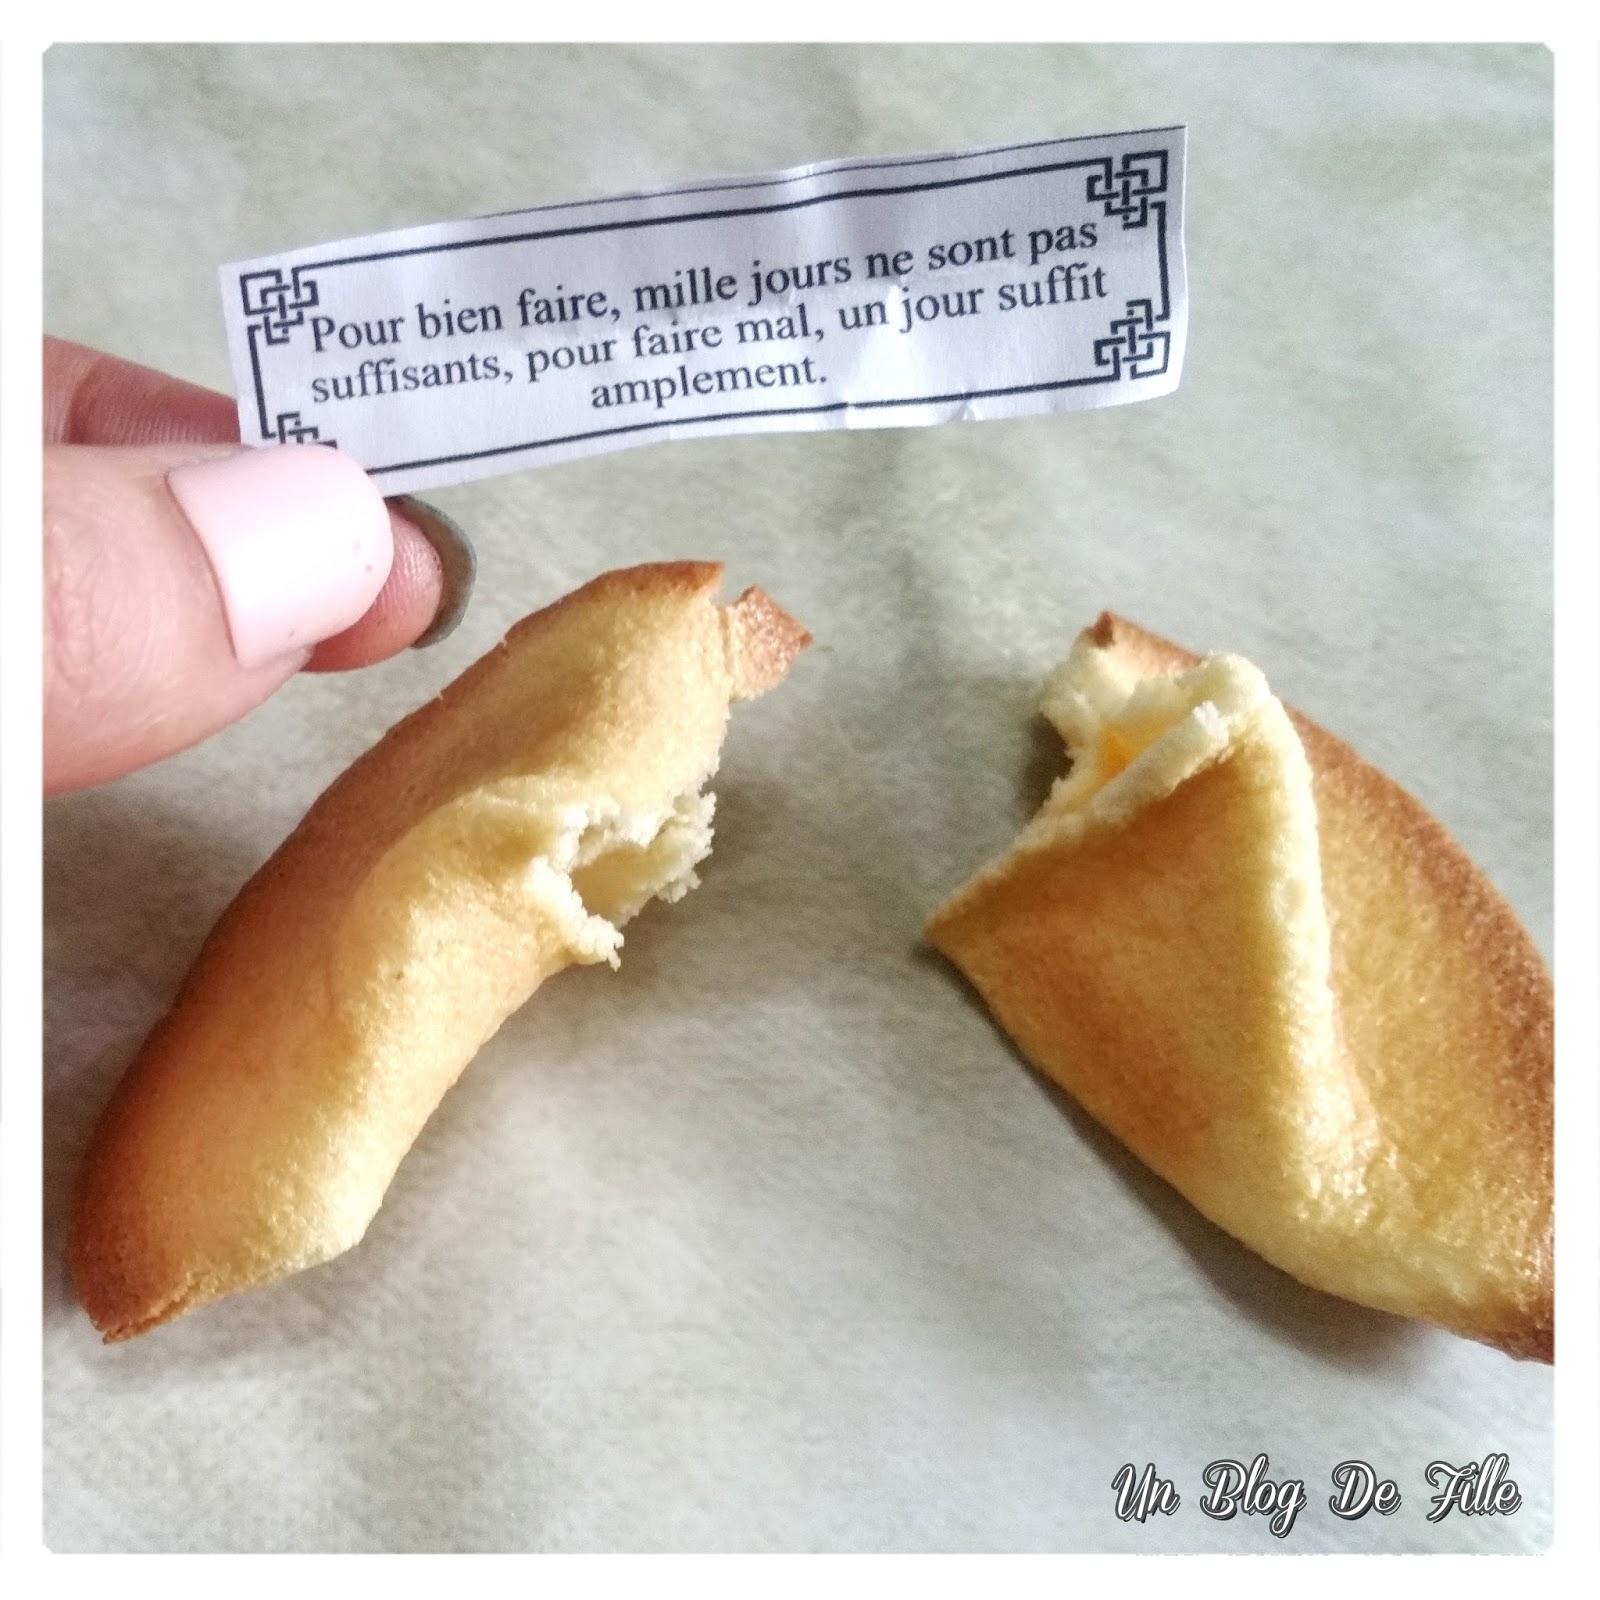 http://unblogdefille.blogspot.fr/2018/02/recette-fortune-cookie-messages-imprimer.html